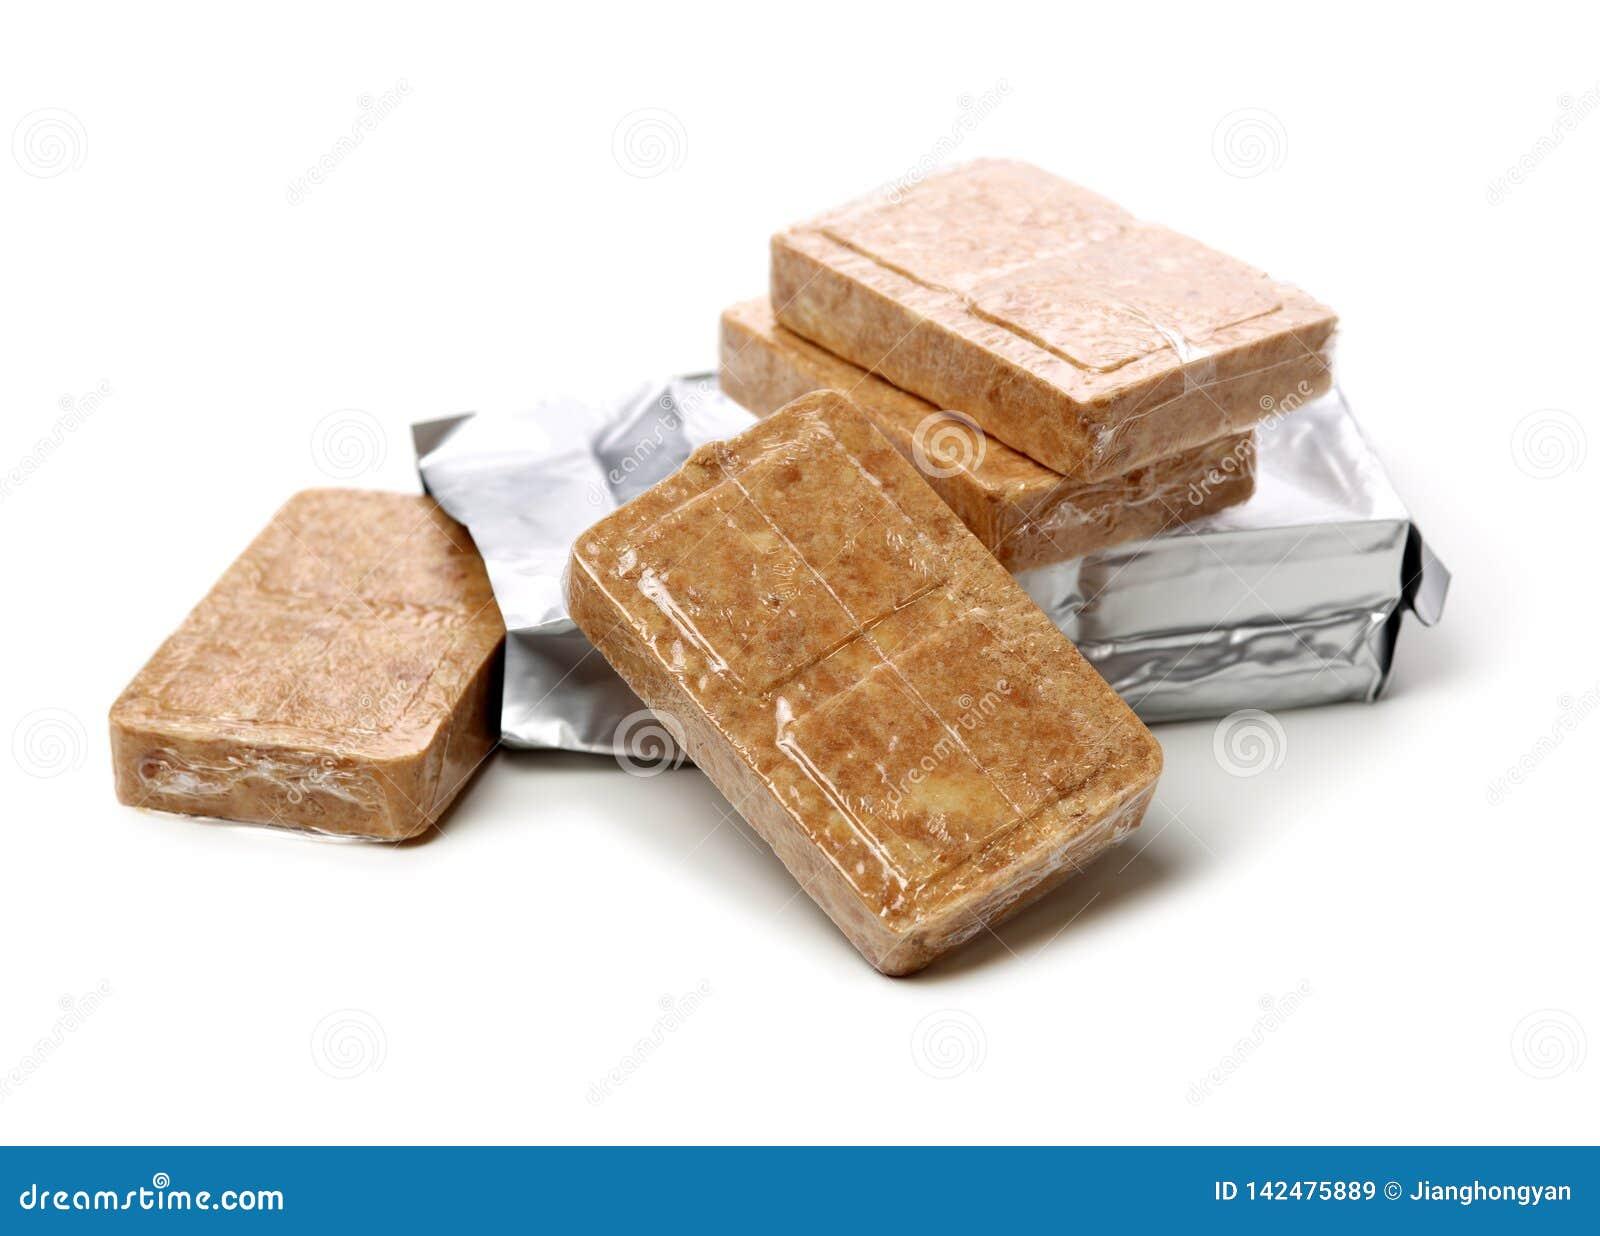 Samengeperst koekjesvoedsel